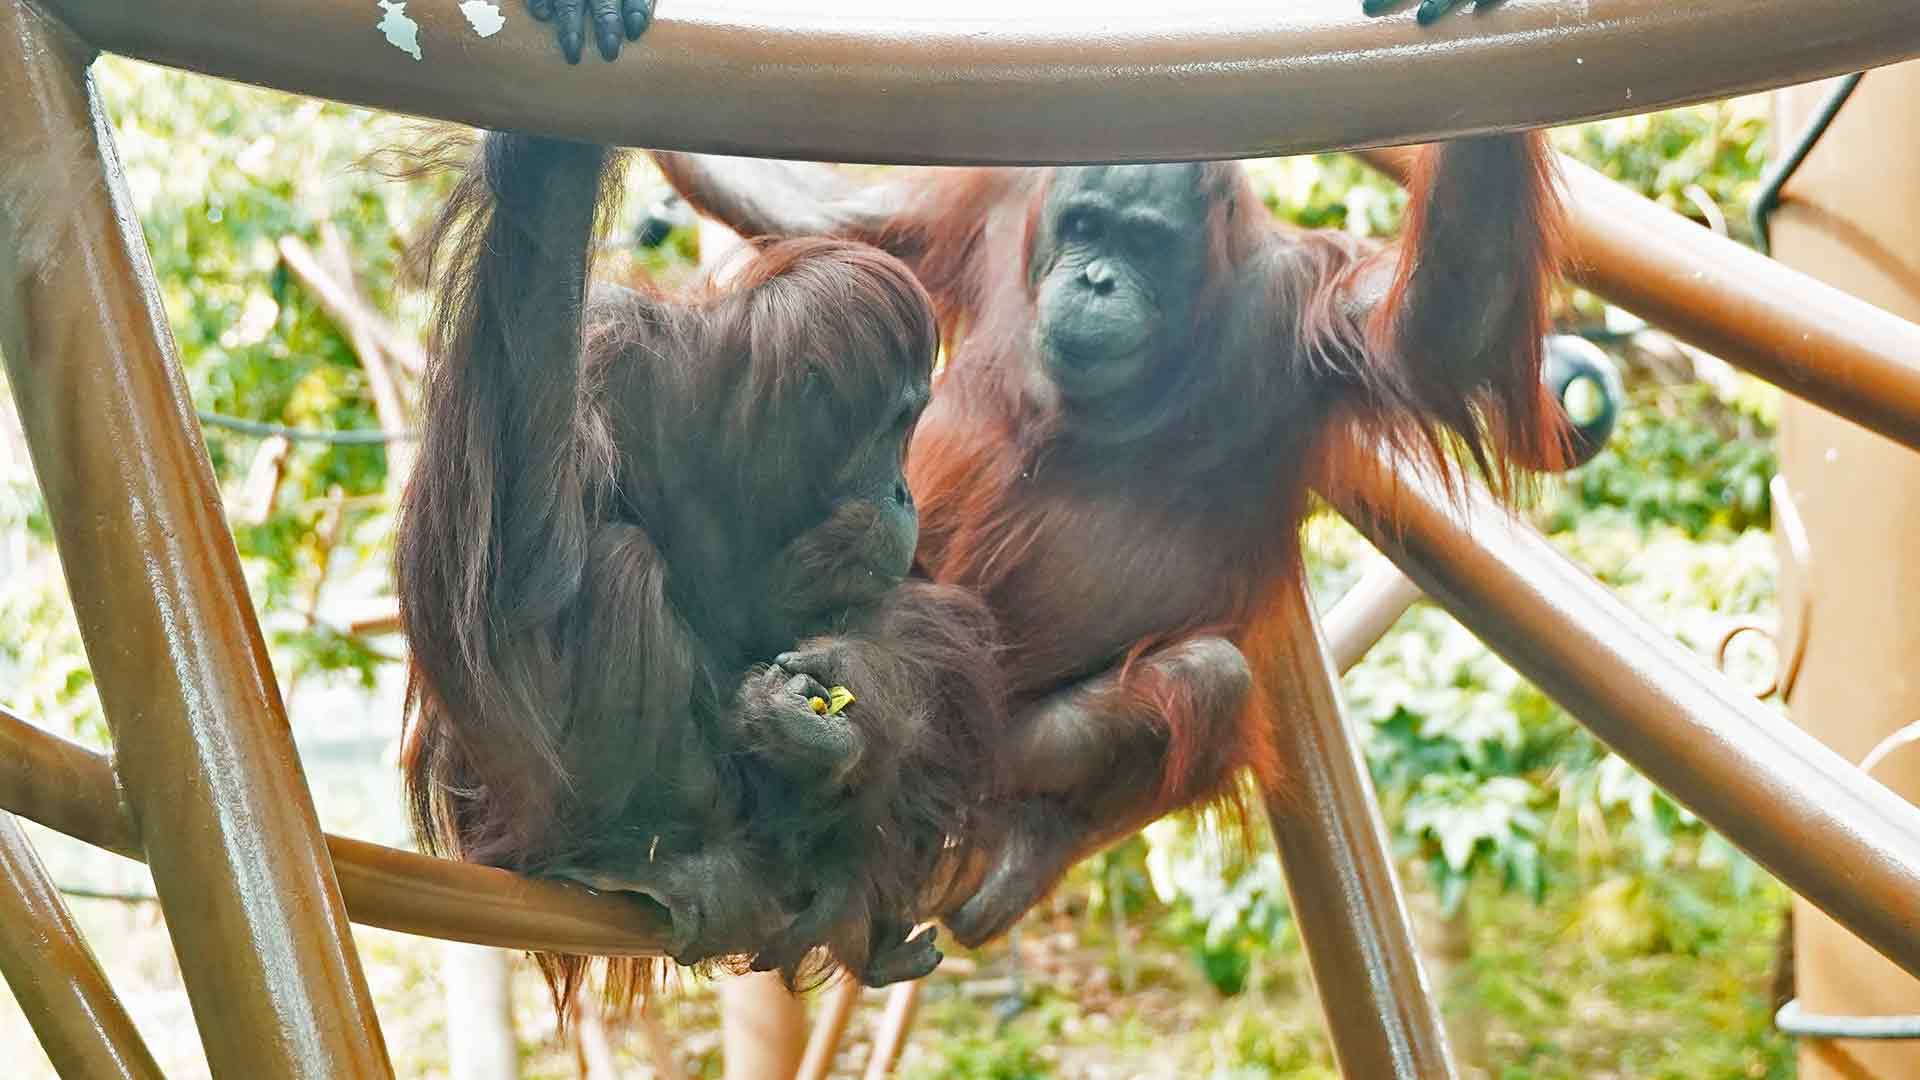 https://rfacdn.nz/zoo/assets/media/tara-orangutan-gallery-1.jpg